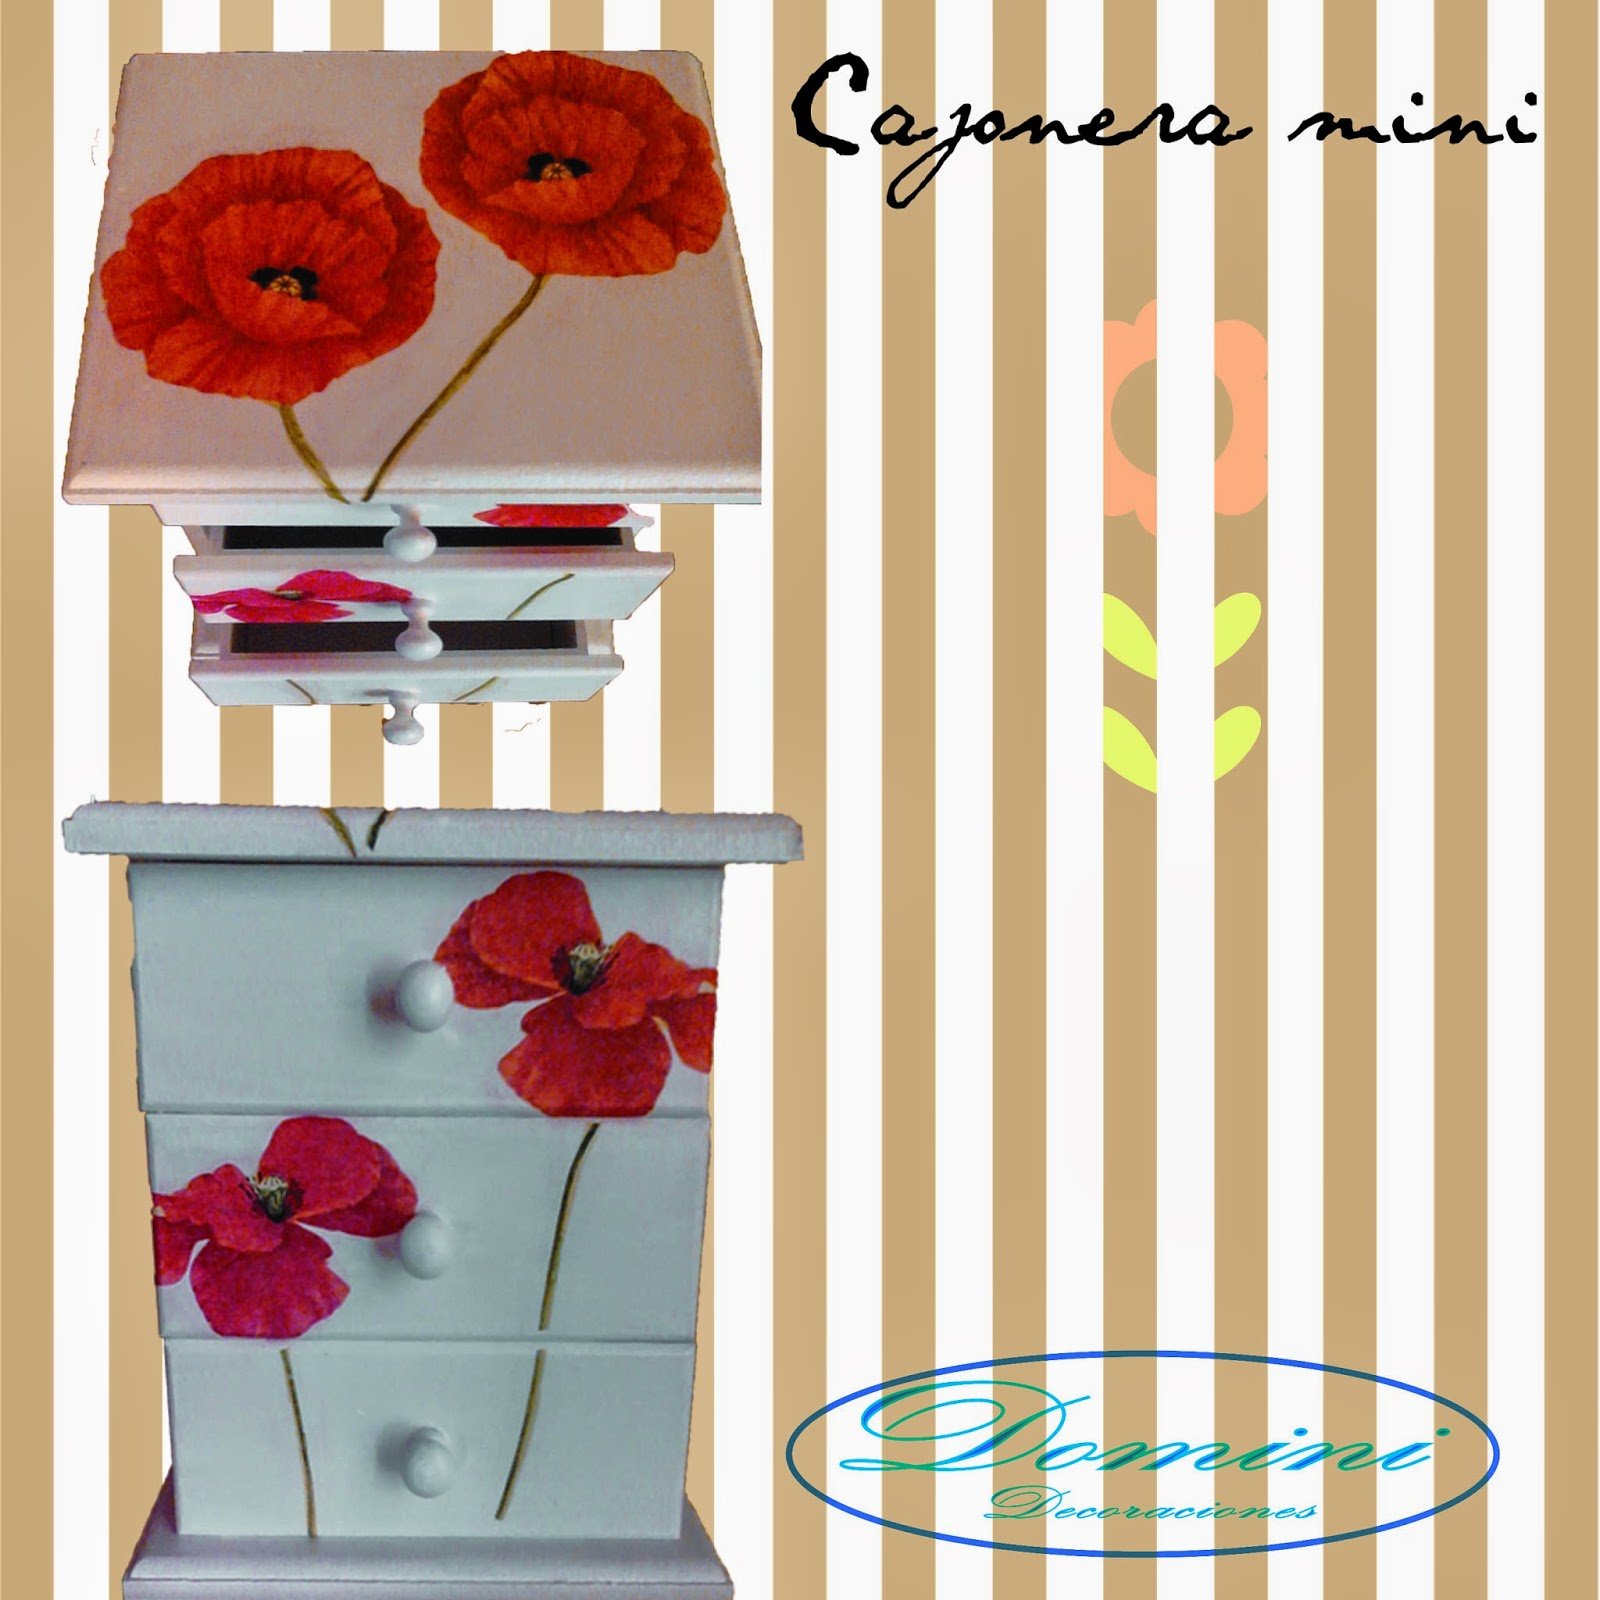 Cajoneras mini decoradas domini decoraciones - Cajoneras decoradas ...